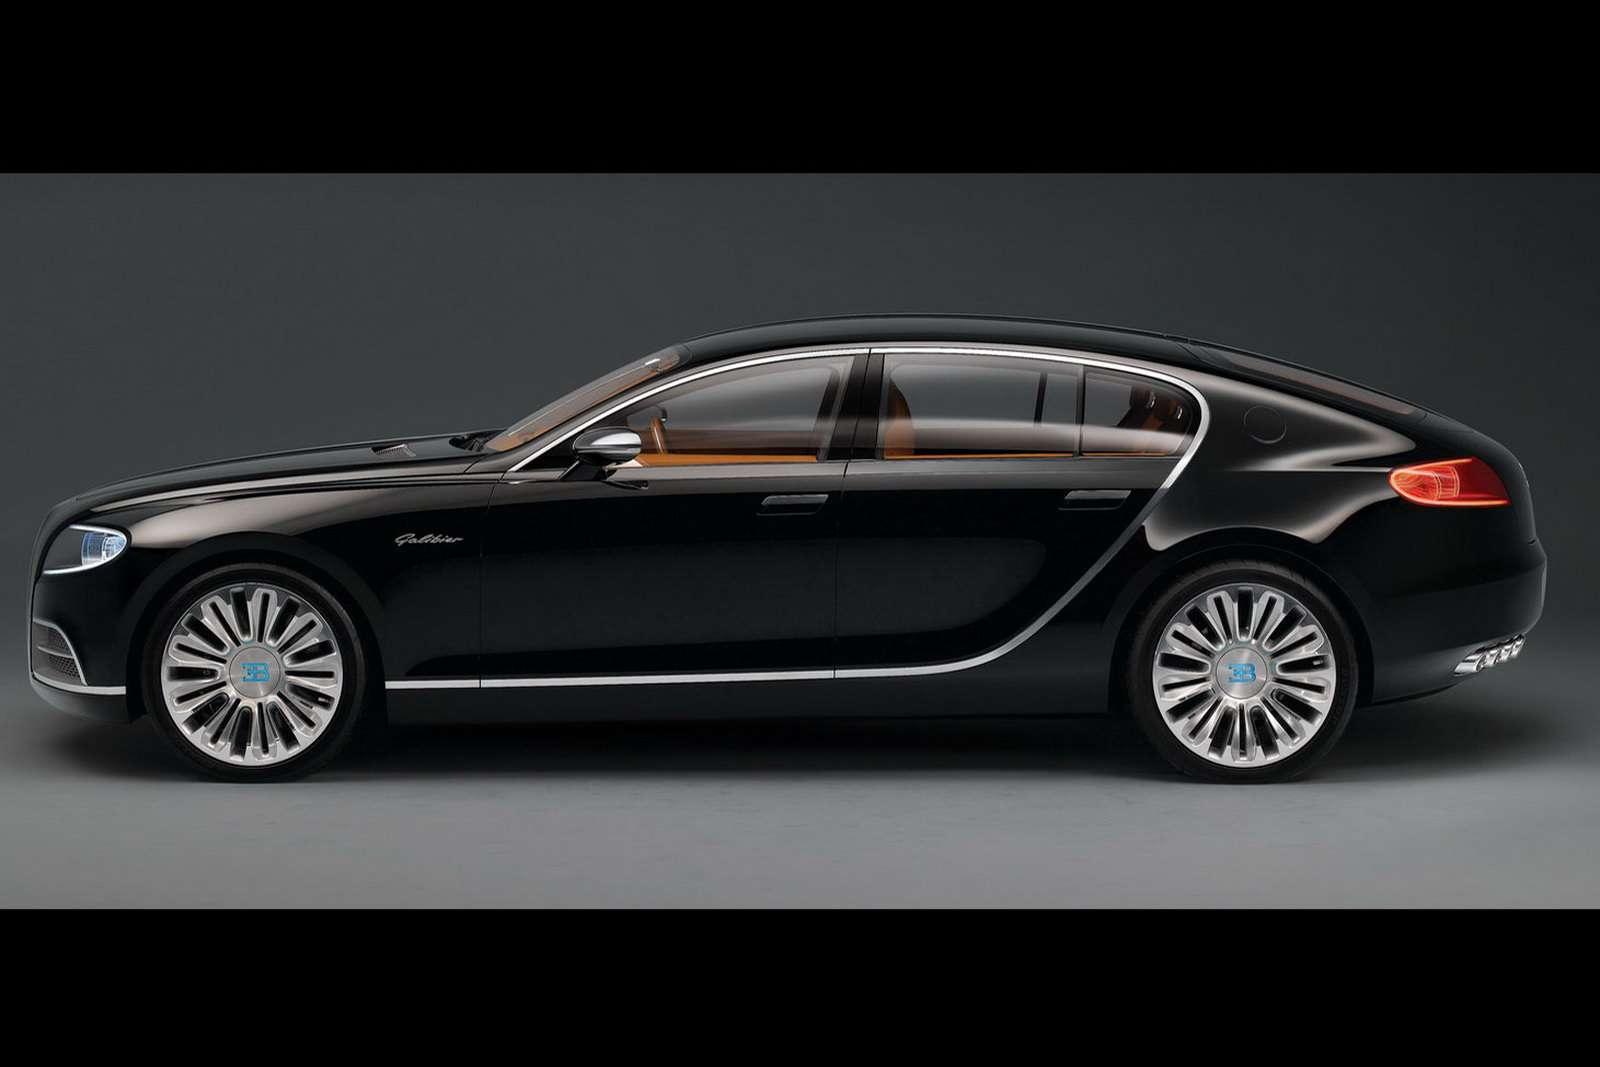 bugatti-sedan-genewa-2012_02.jpg